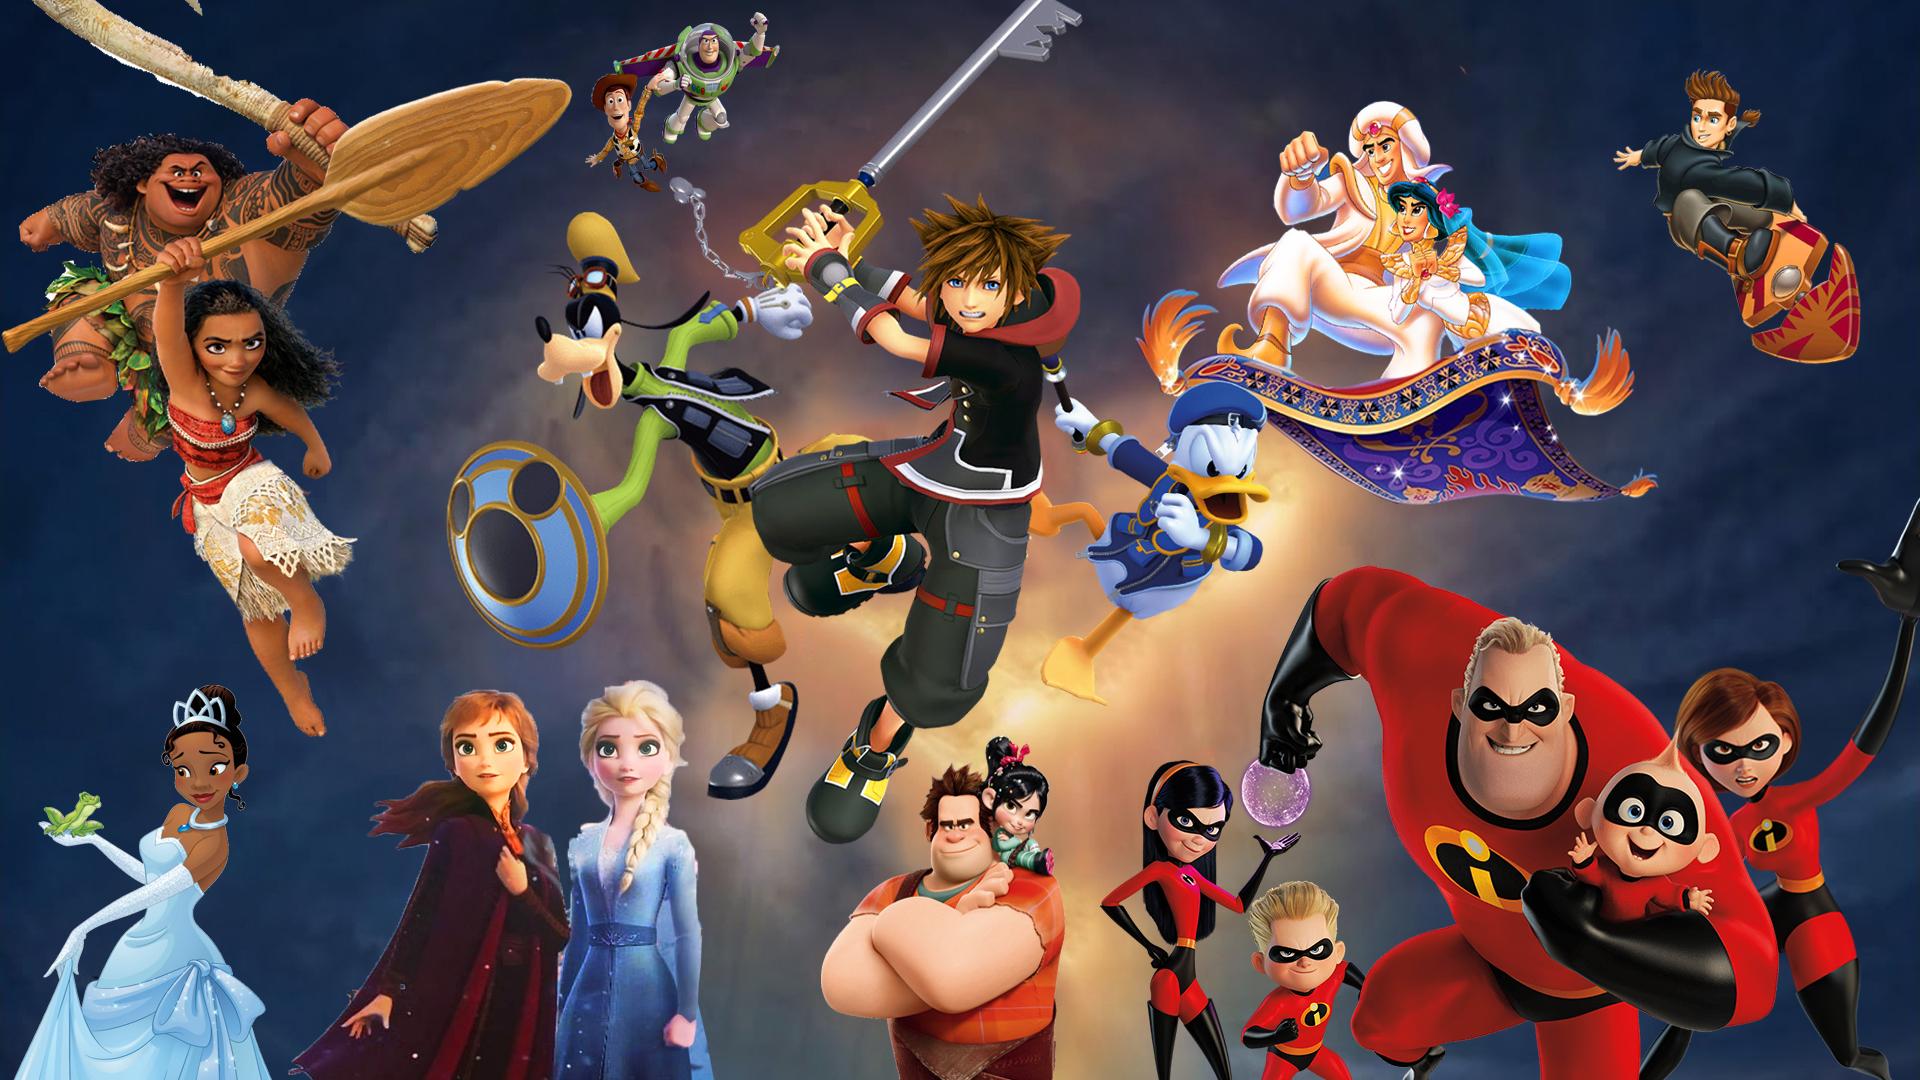 Kingdom Hearts 4